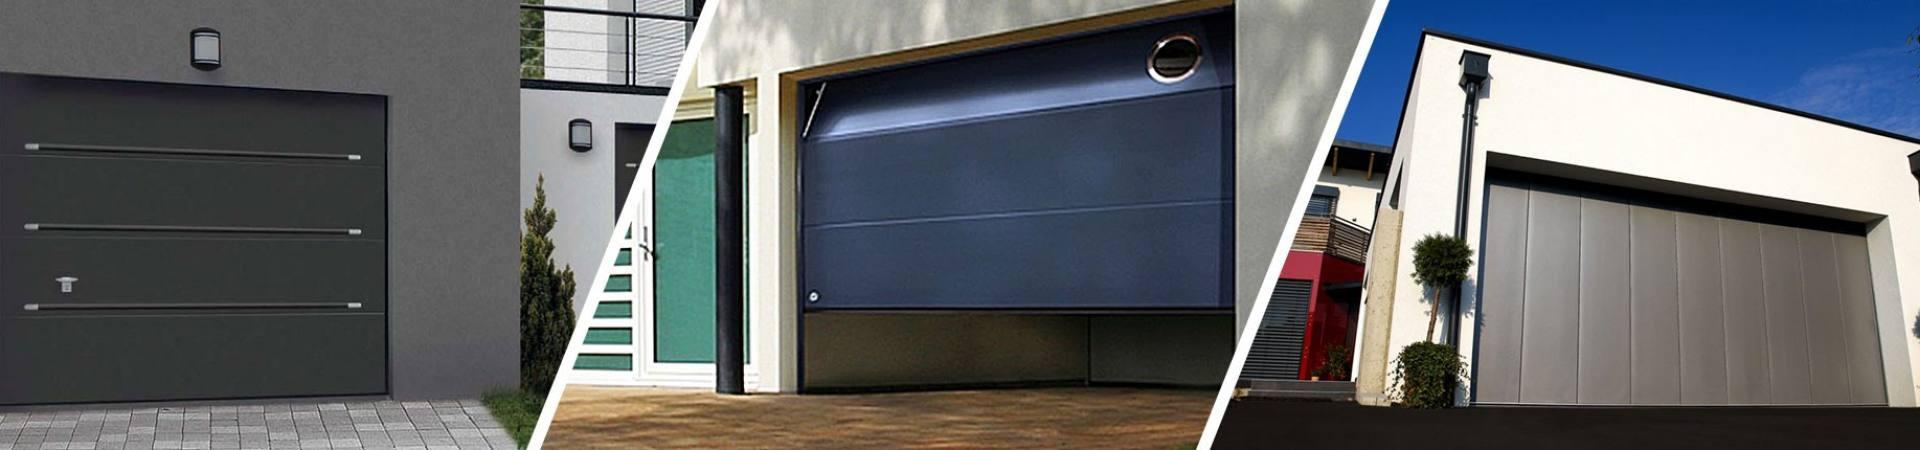 Porte garage sectionelles